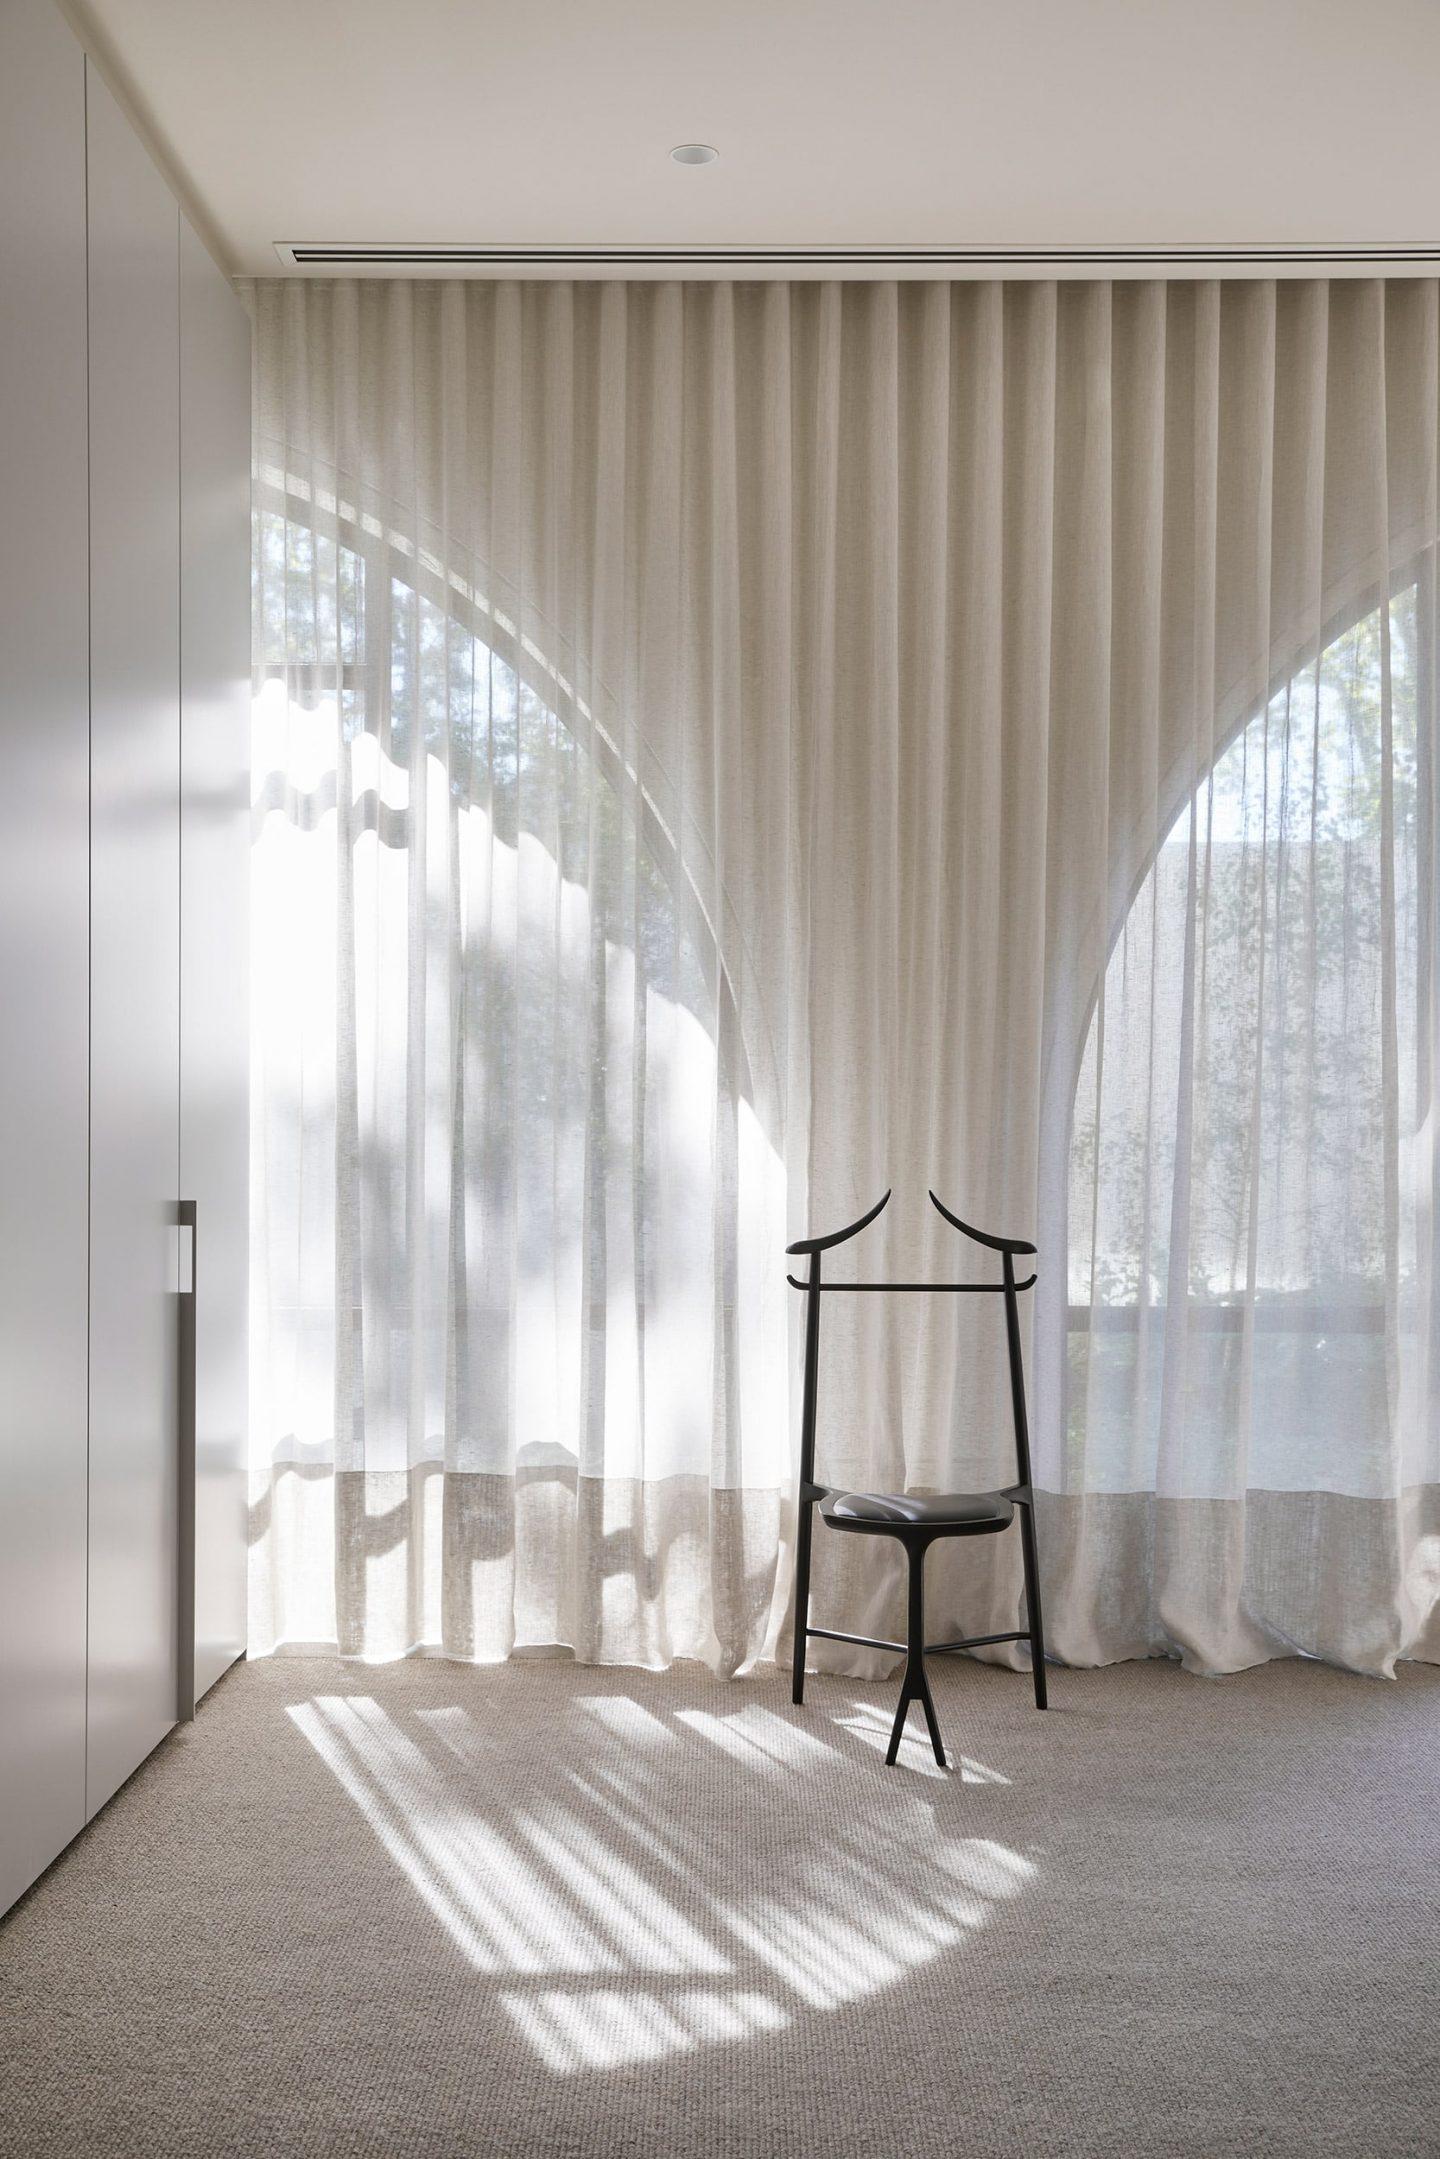 IGNANT-Architecture-Jolson-Huntingtower-Road-011